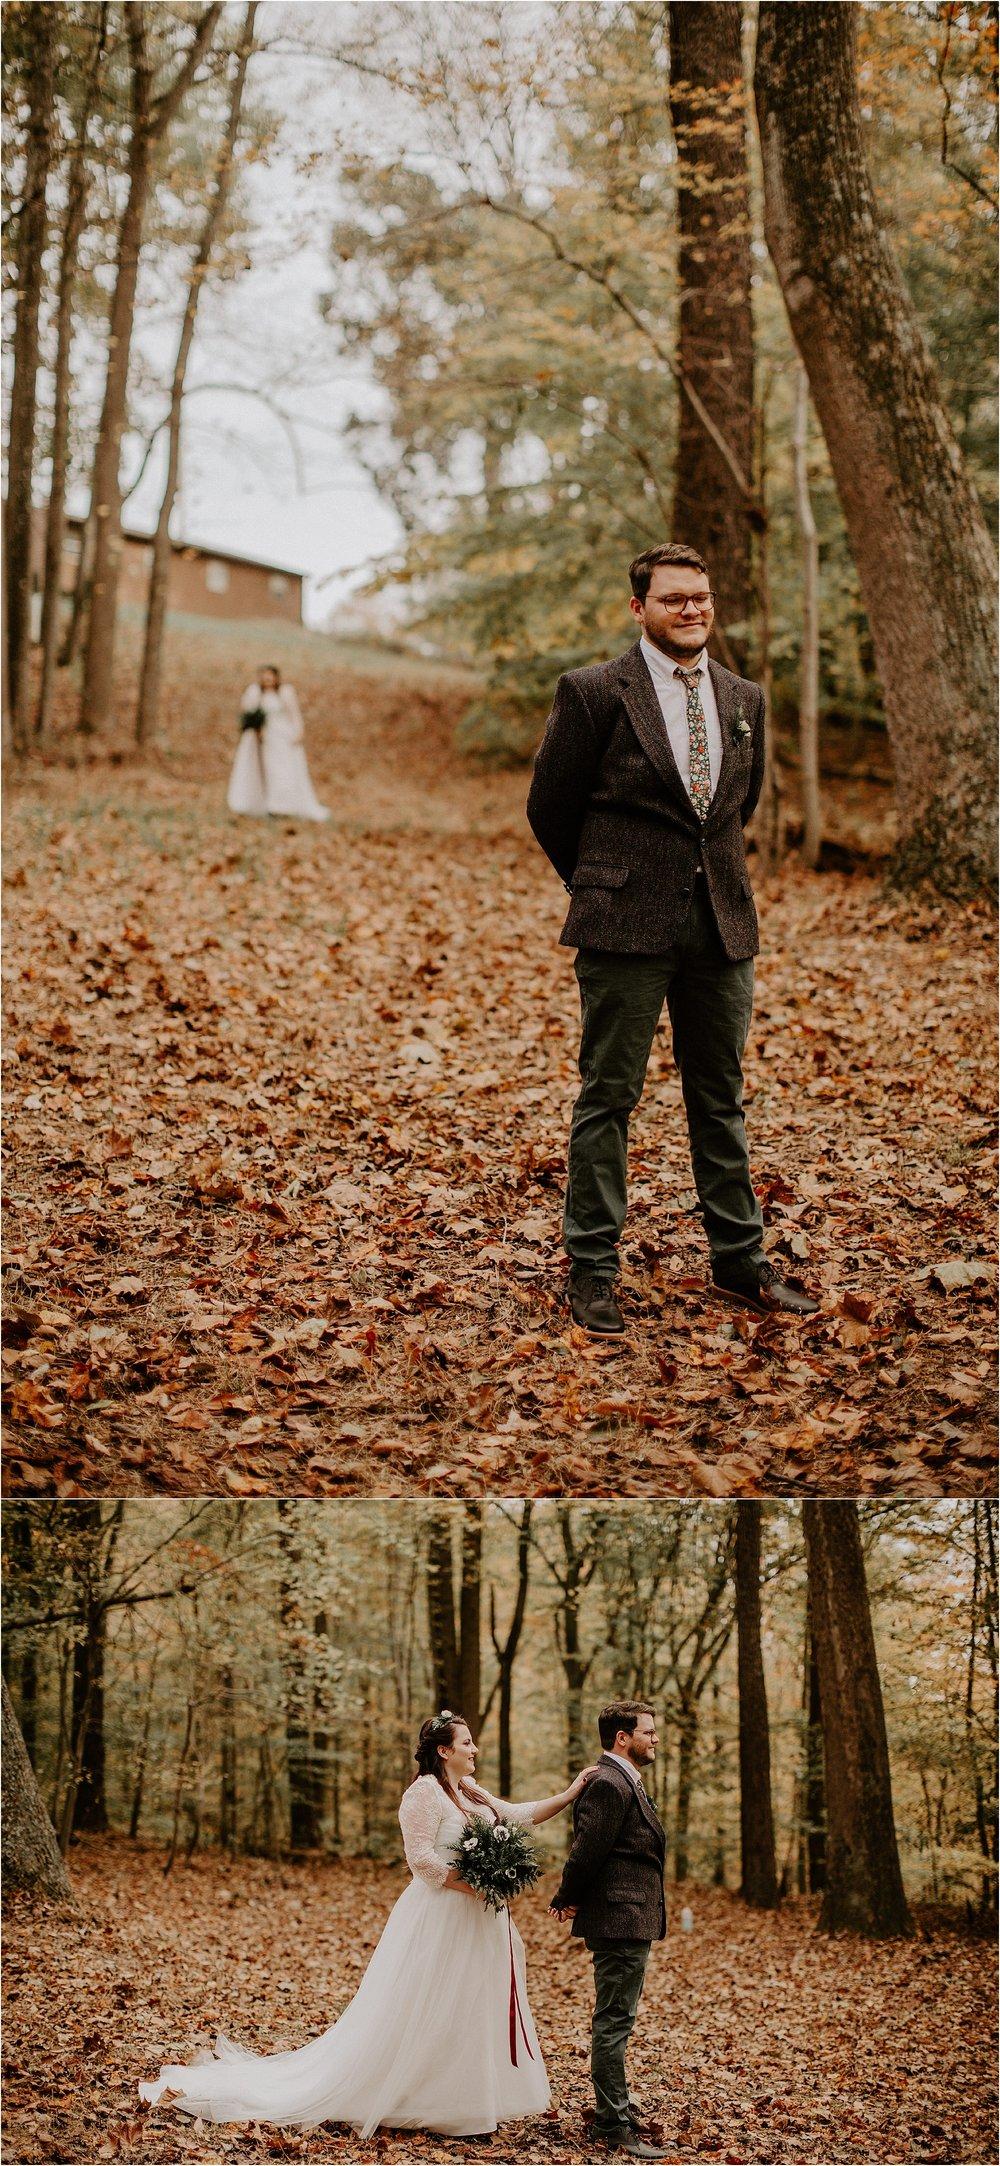 Sarah_Brookhart_Baltimore_Wedding_Photographer_0016.jpg